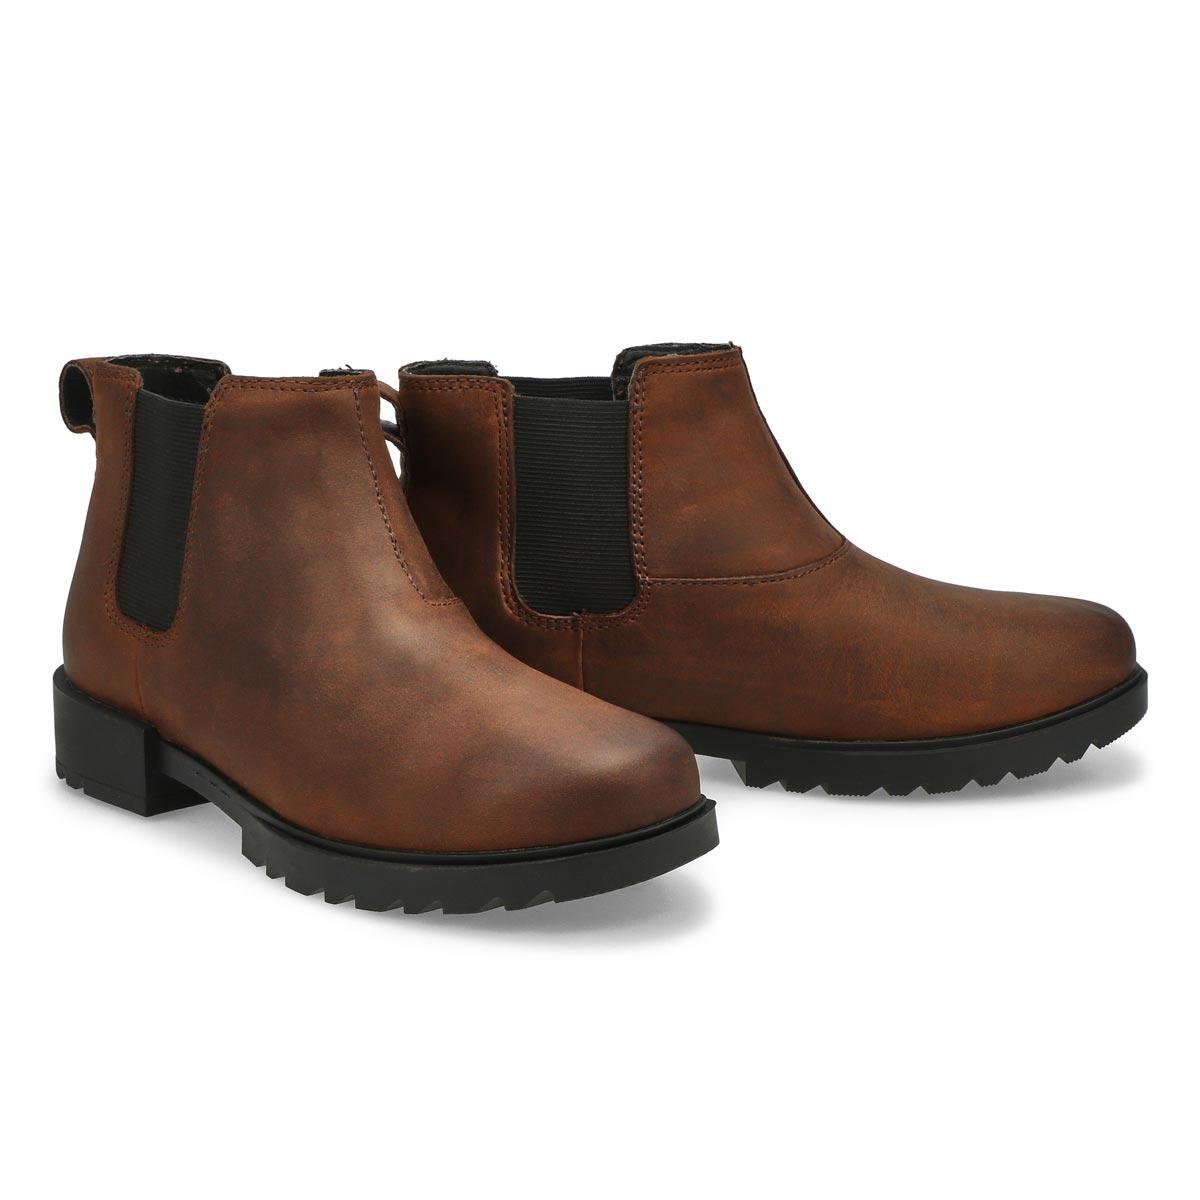 Women's Emelie II Chelsea Waterproof Boot - Fallen